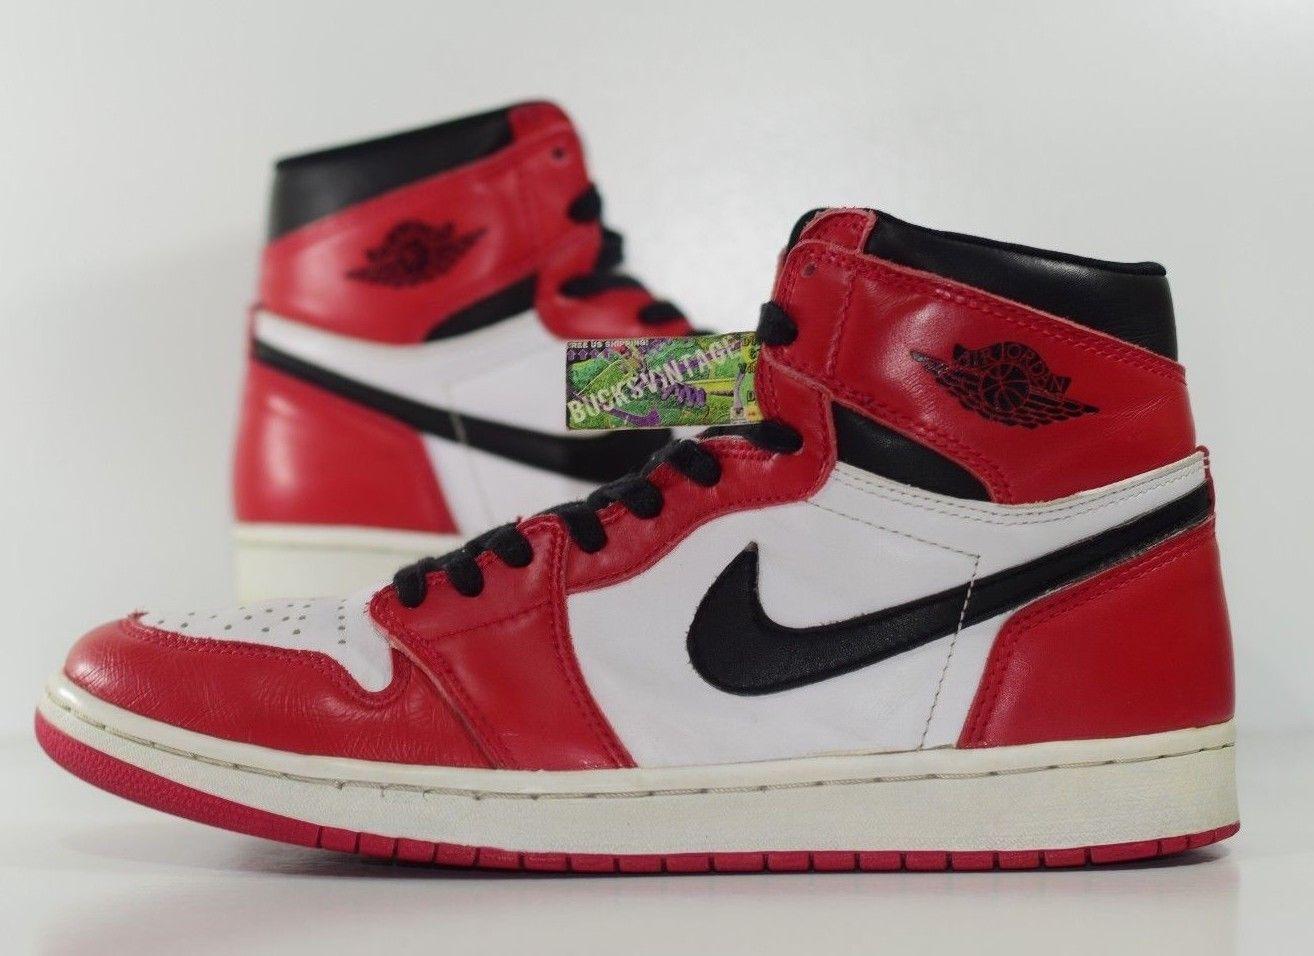 detailed look ce1eb 2dd81 Size 12 | 1994 Nike Air Jordan 1 High OG Retro Authentic Vintage RARE 130207 -